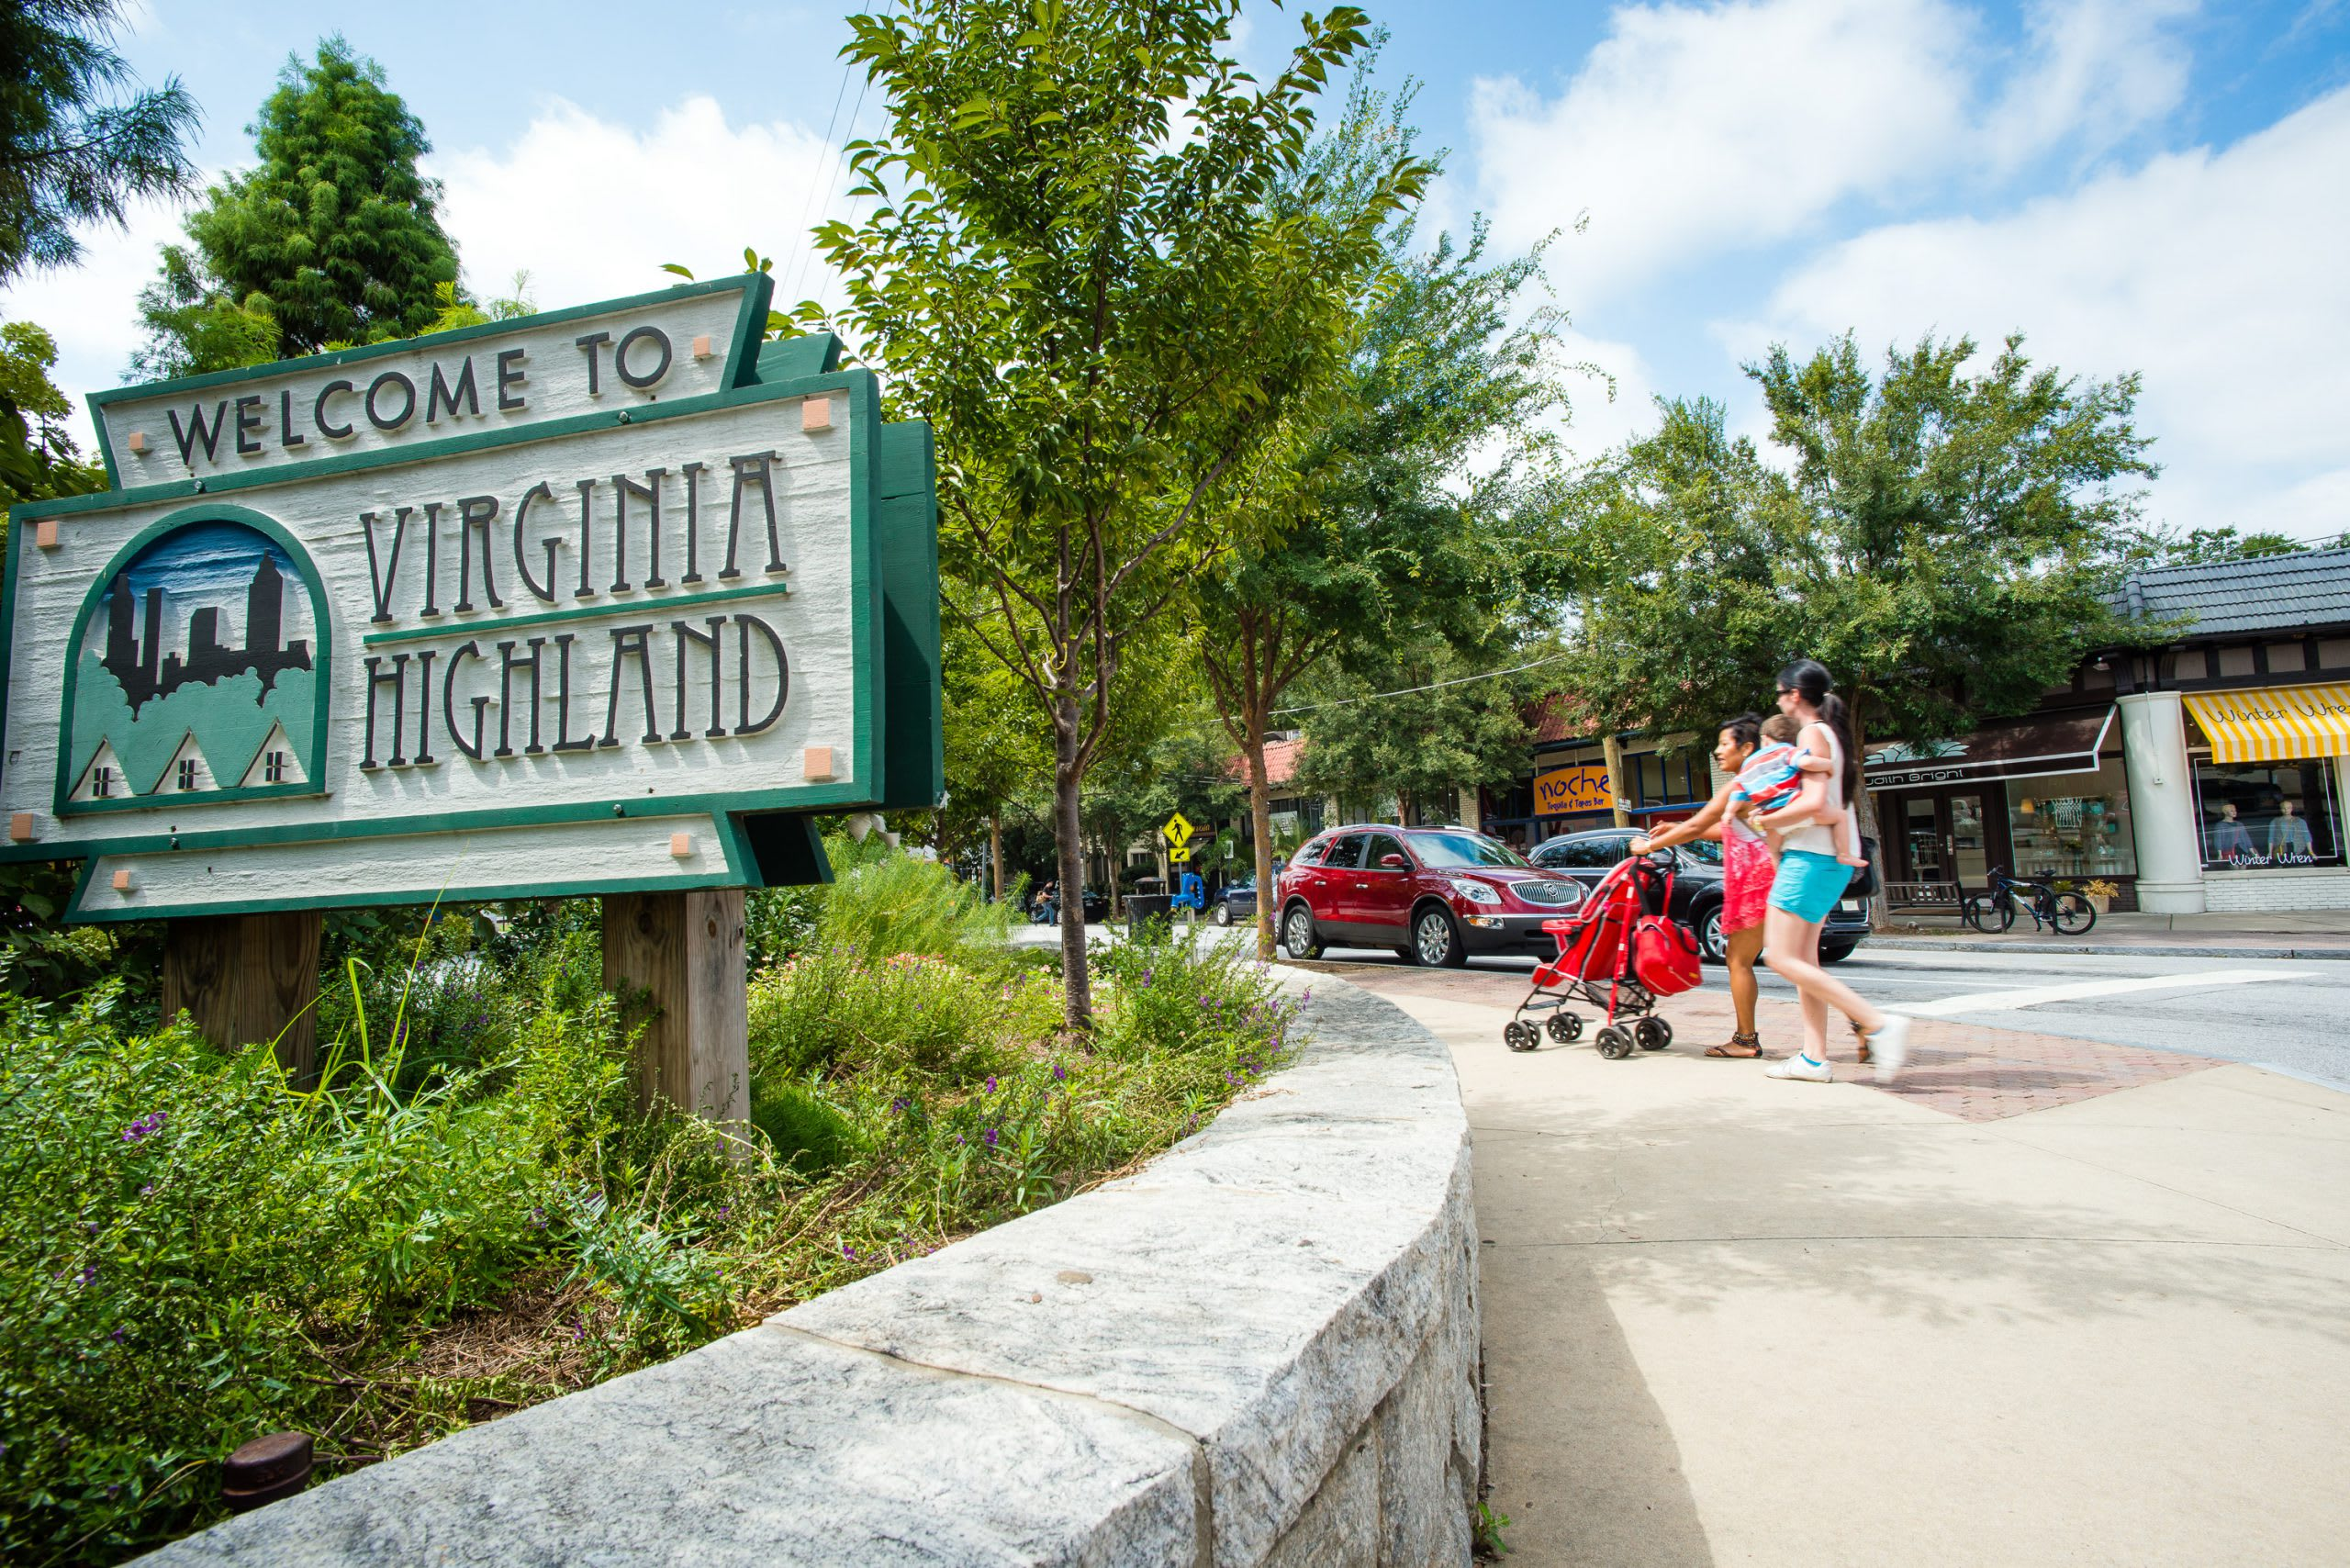 Virginia-Highland neighborhood